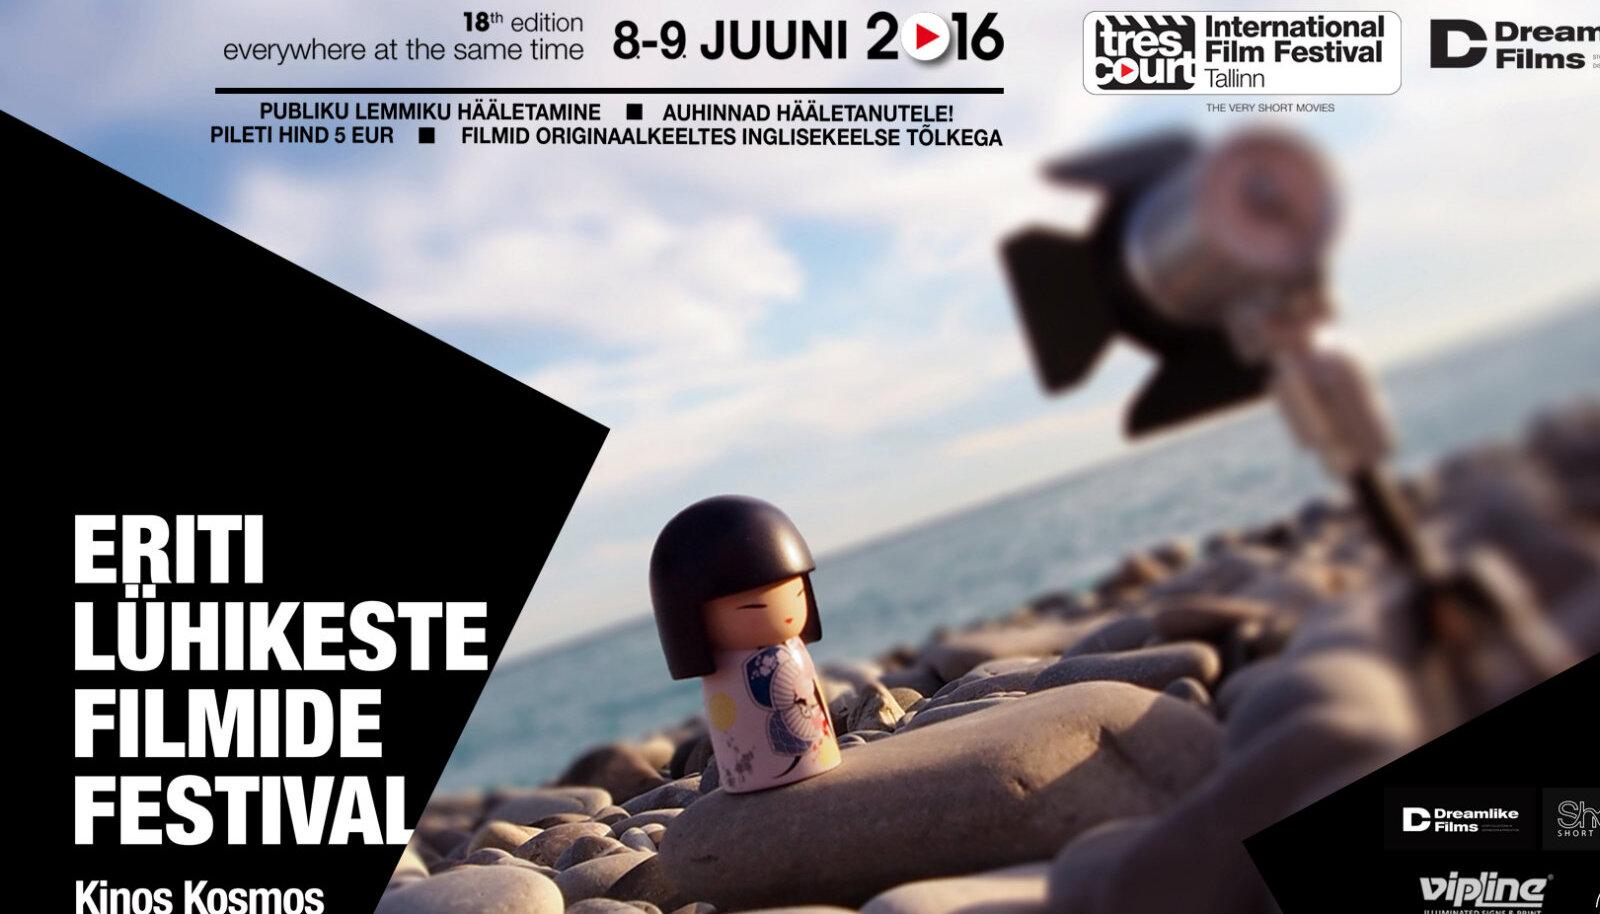 Eriti lühikeste filmide festival